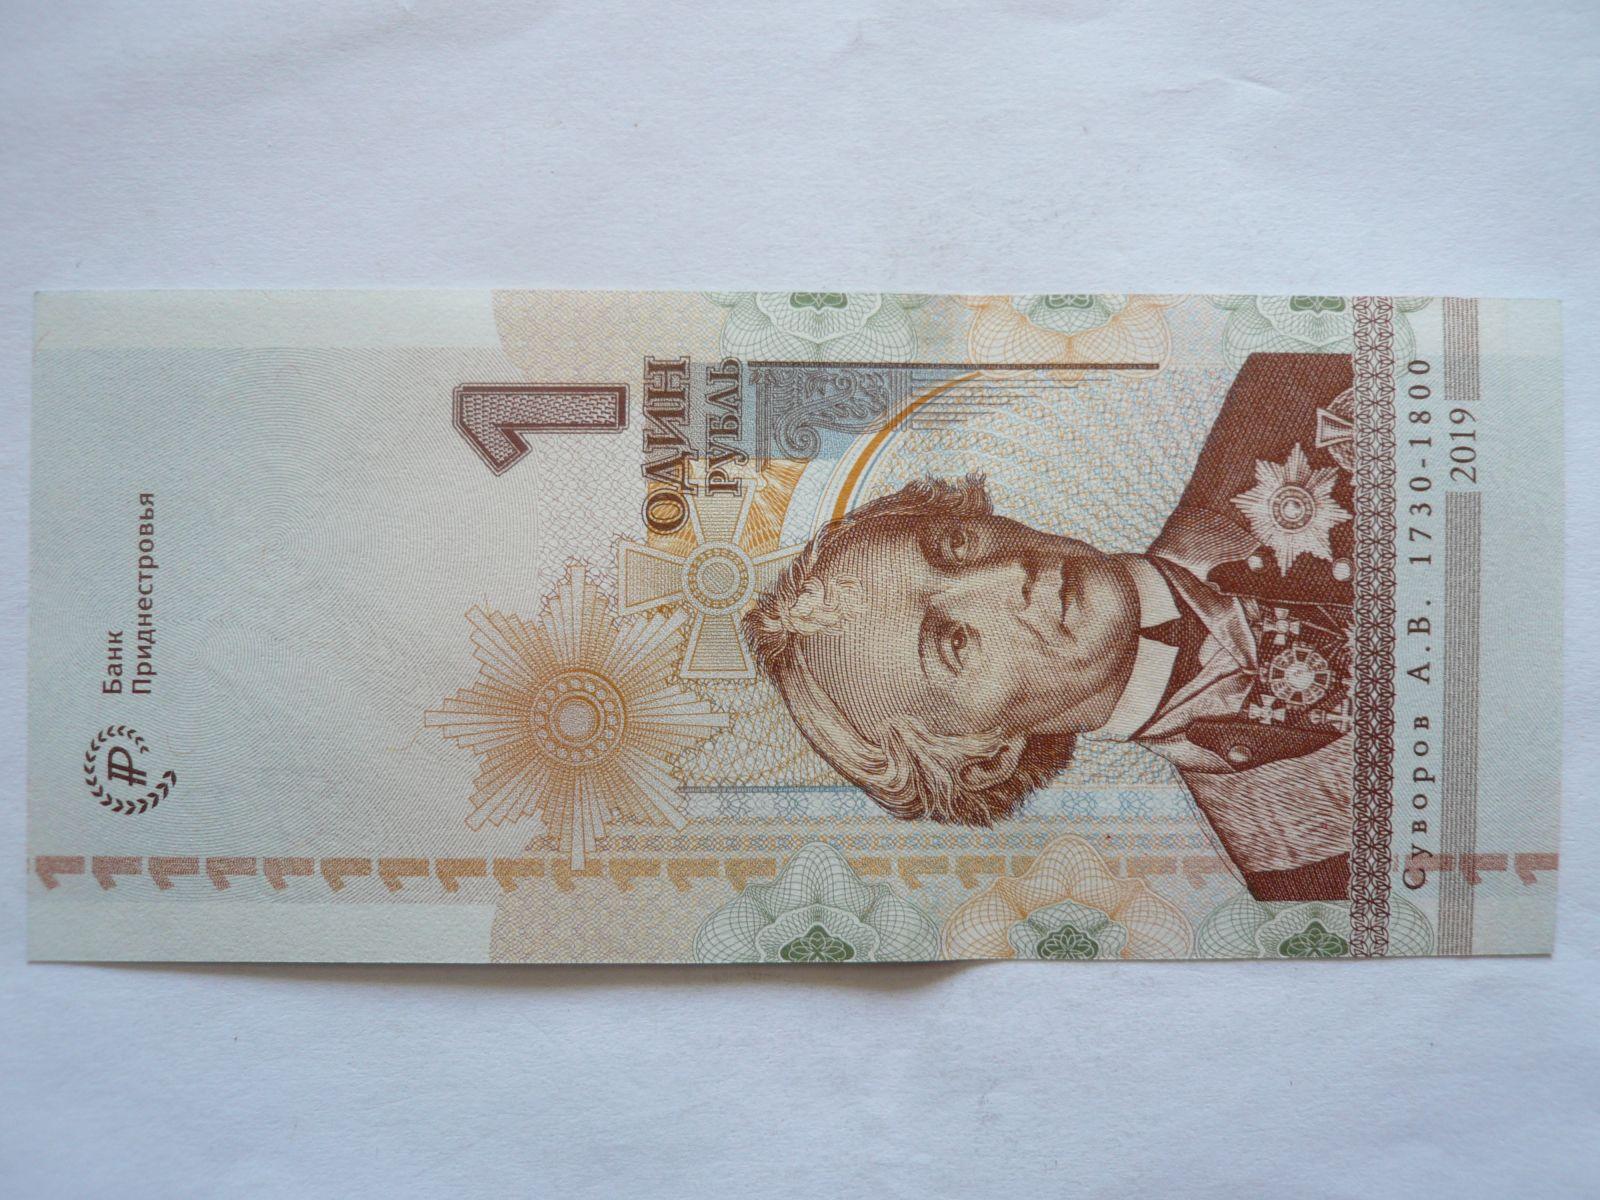 1 Rubl, Suvorov 2019, Rusko